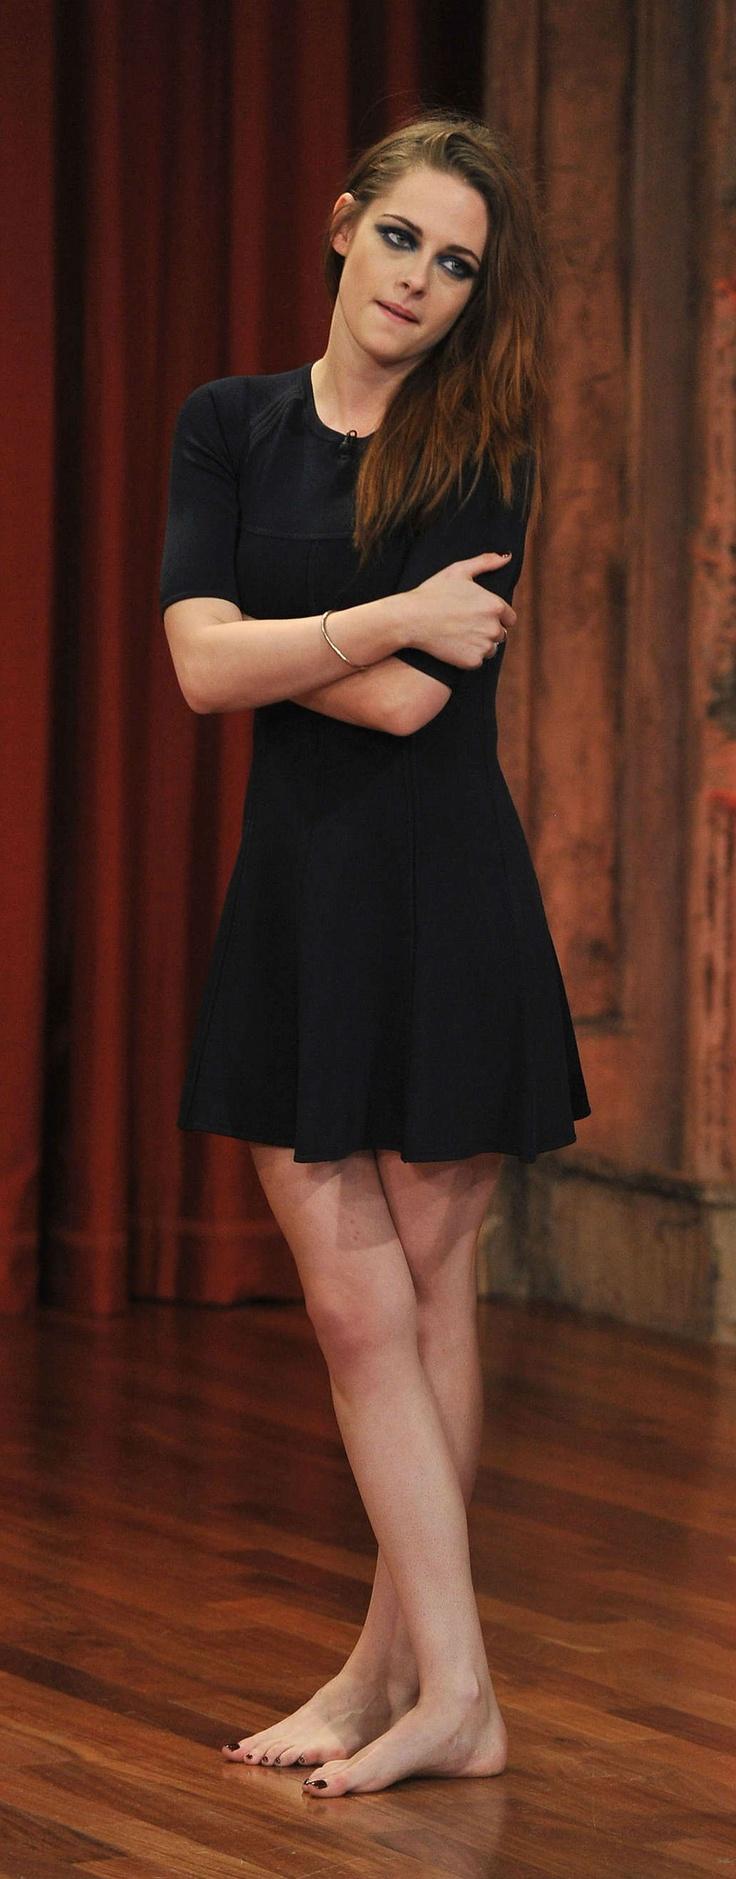 Kristen Stewart on Jimmy Fallon - November 2012